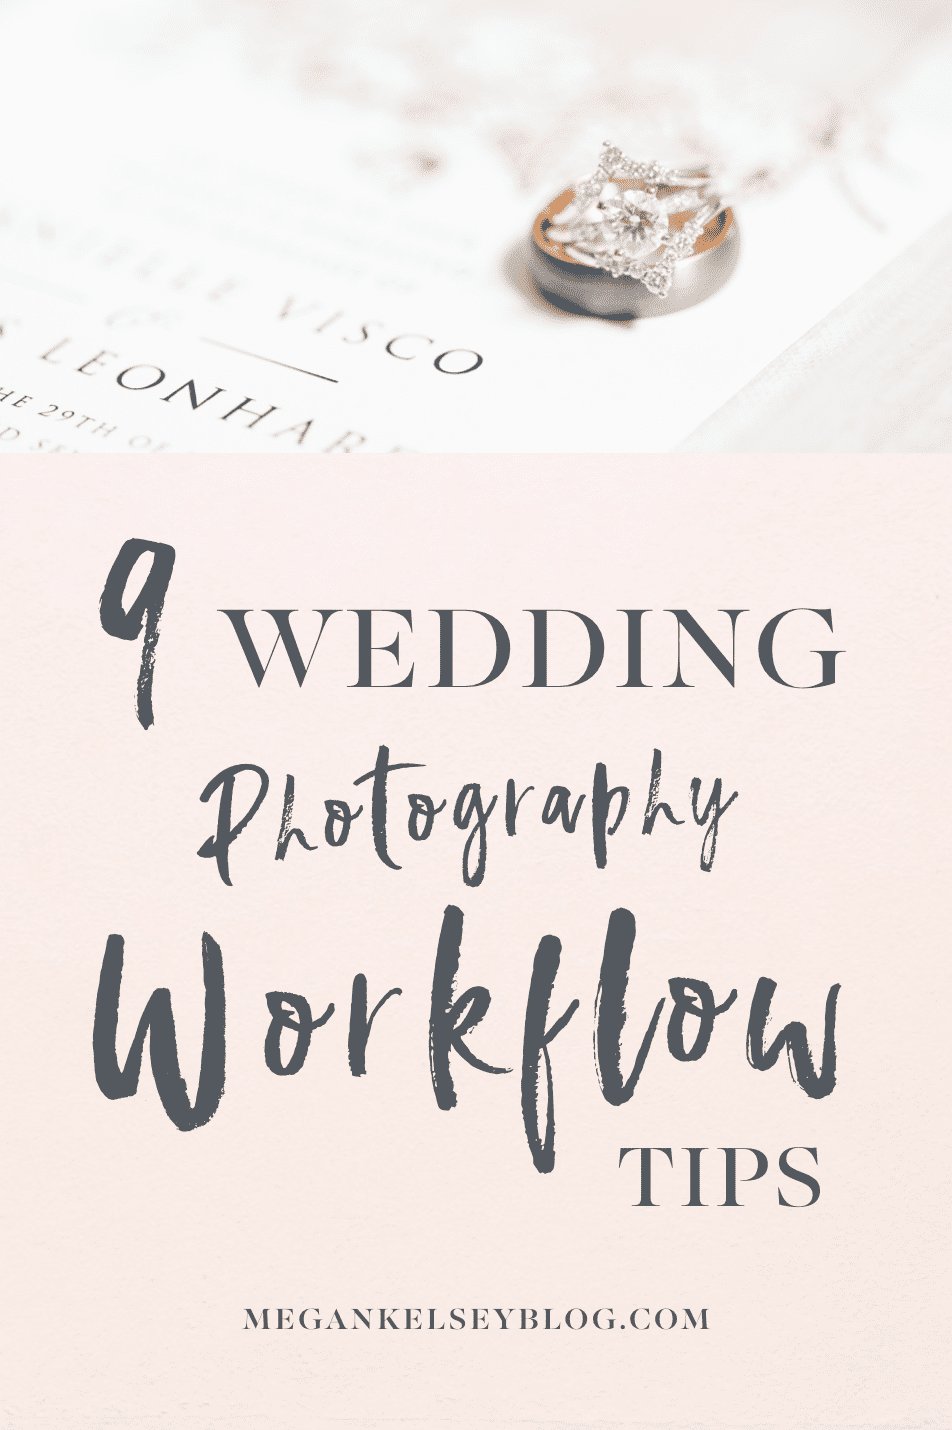 Wedding Photography Workflow Tips